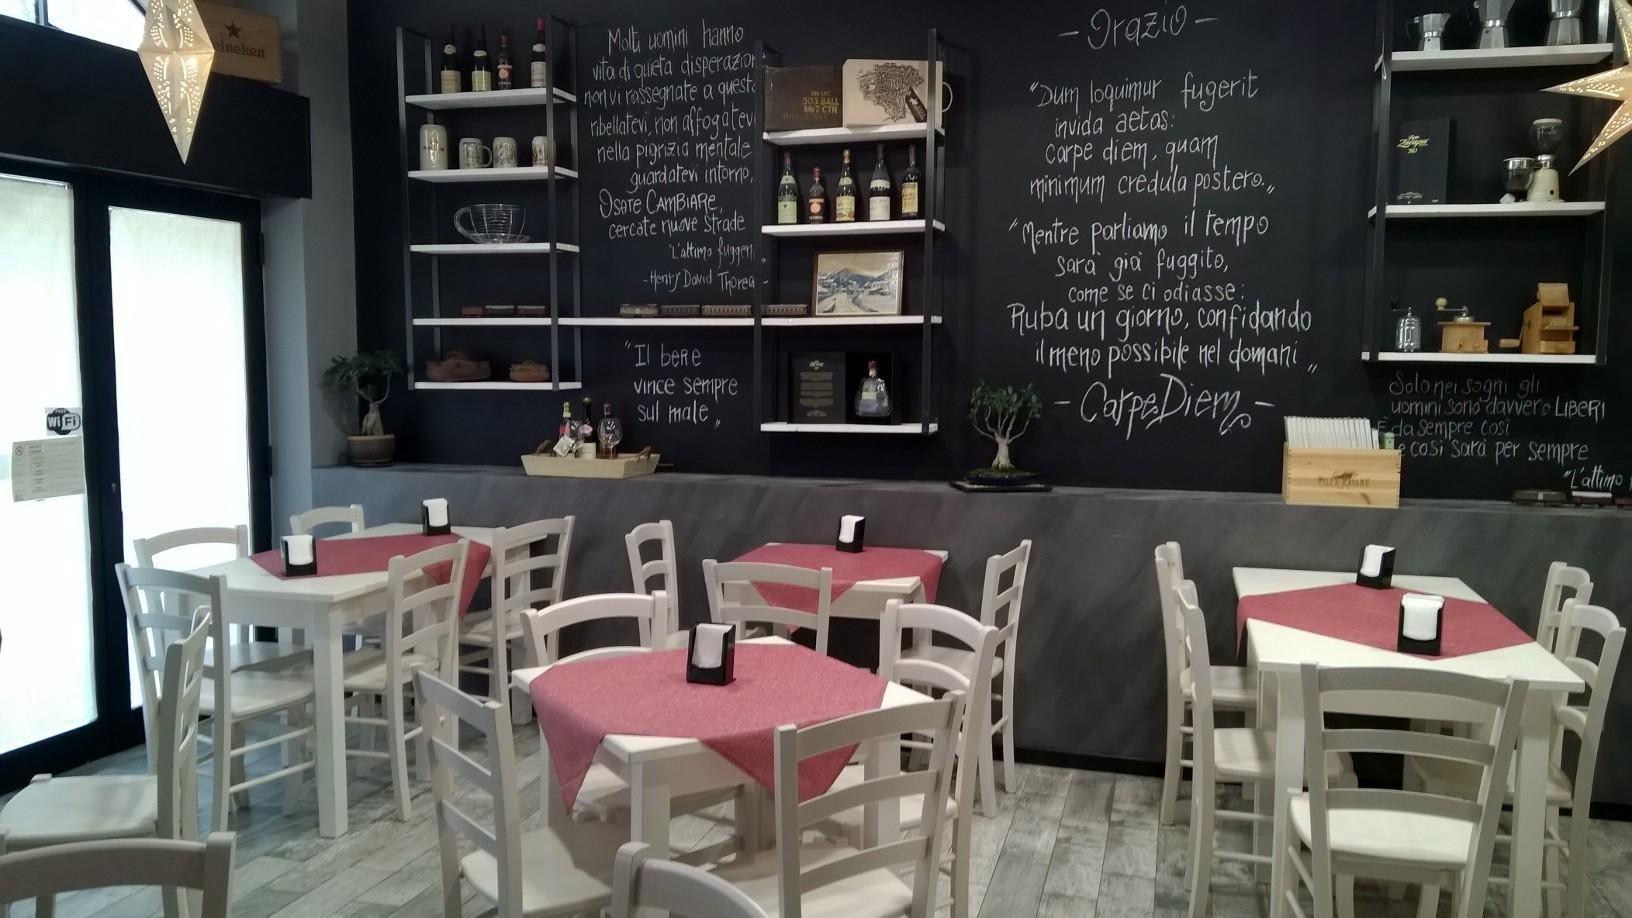 Sedie e tavoli pub ristoranti pizzerie maieron snc www for Arredamento per pizzeria